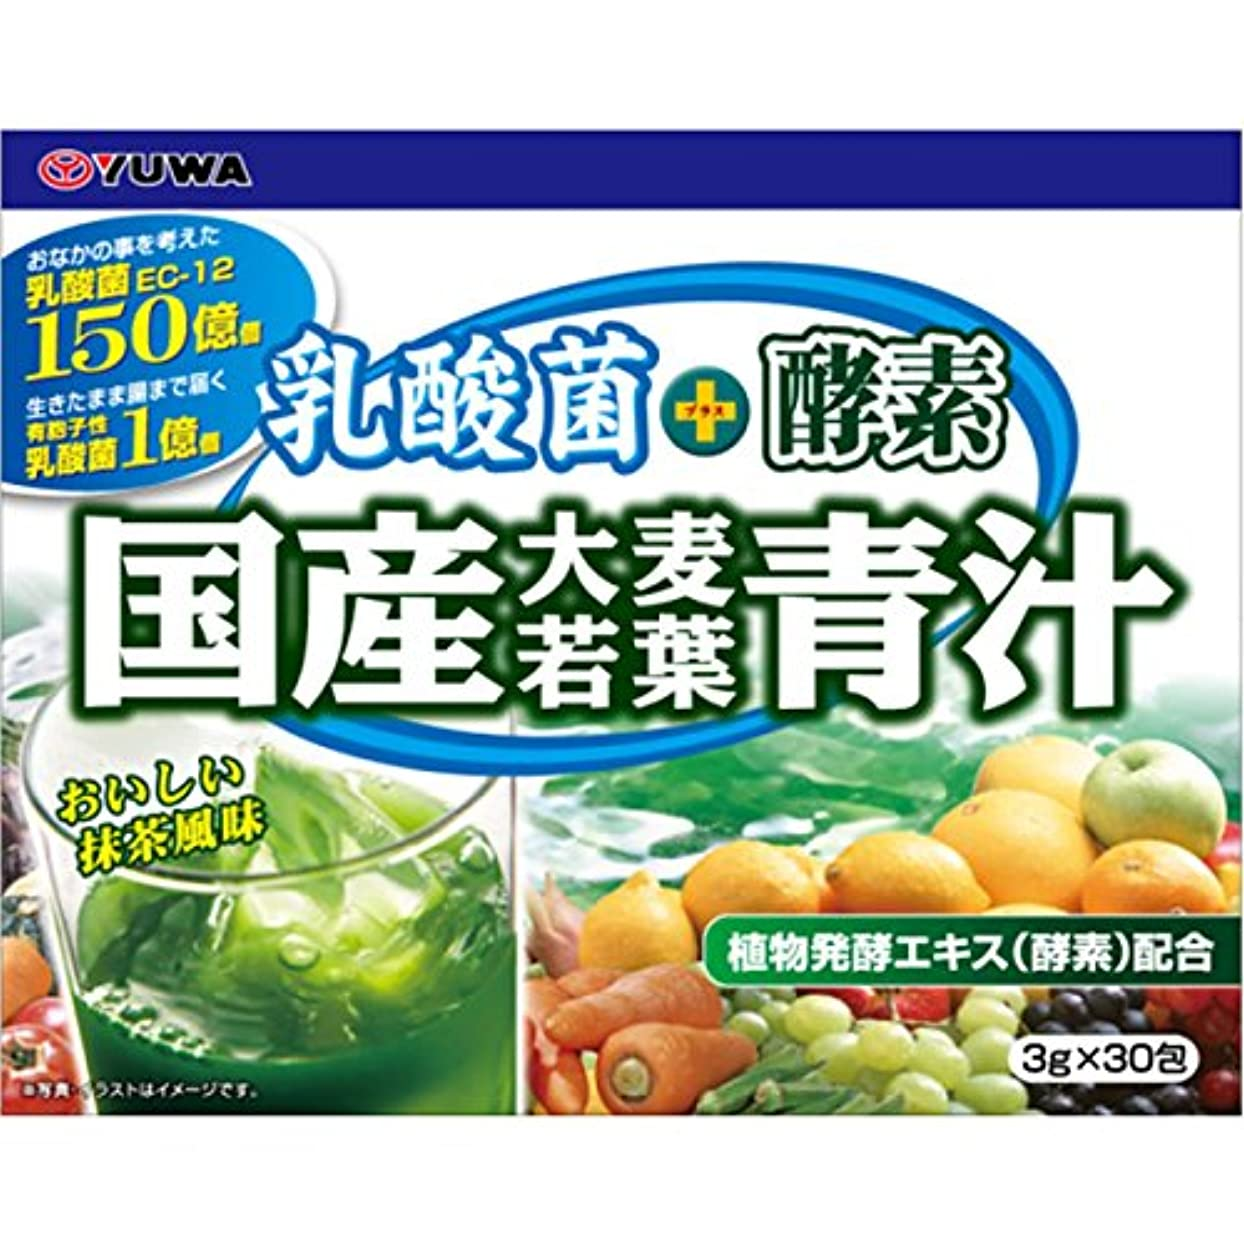 形非効率的な植物学者ユーワ 乳酸菌+酵素 国産大麦若葉青汁 90g (3g×30包)